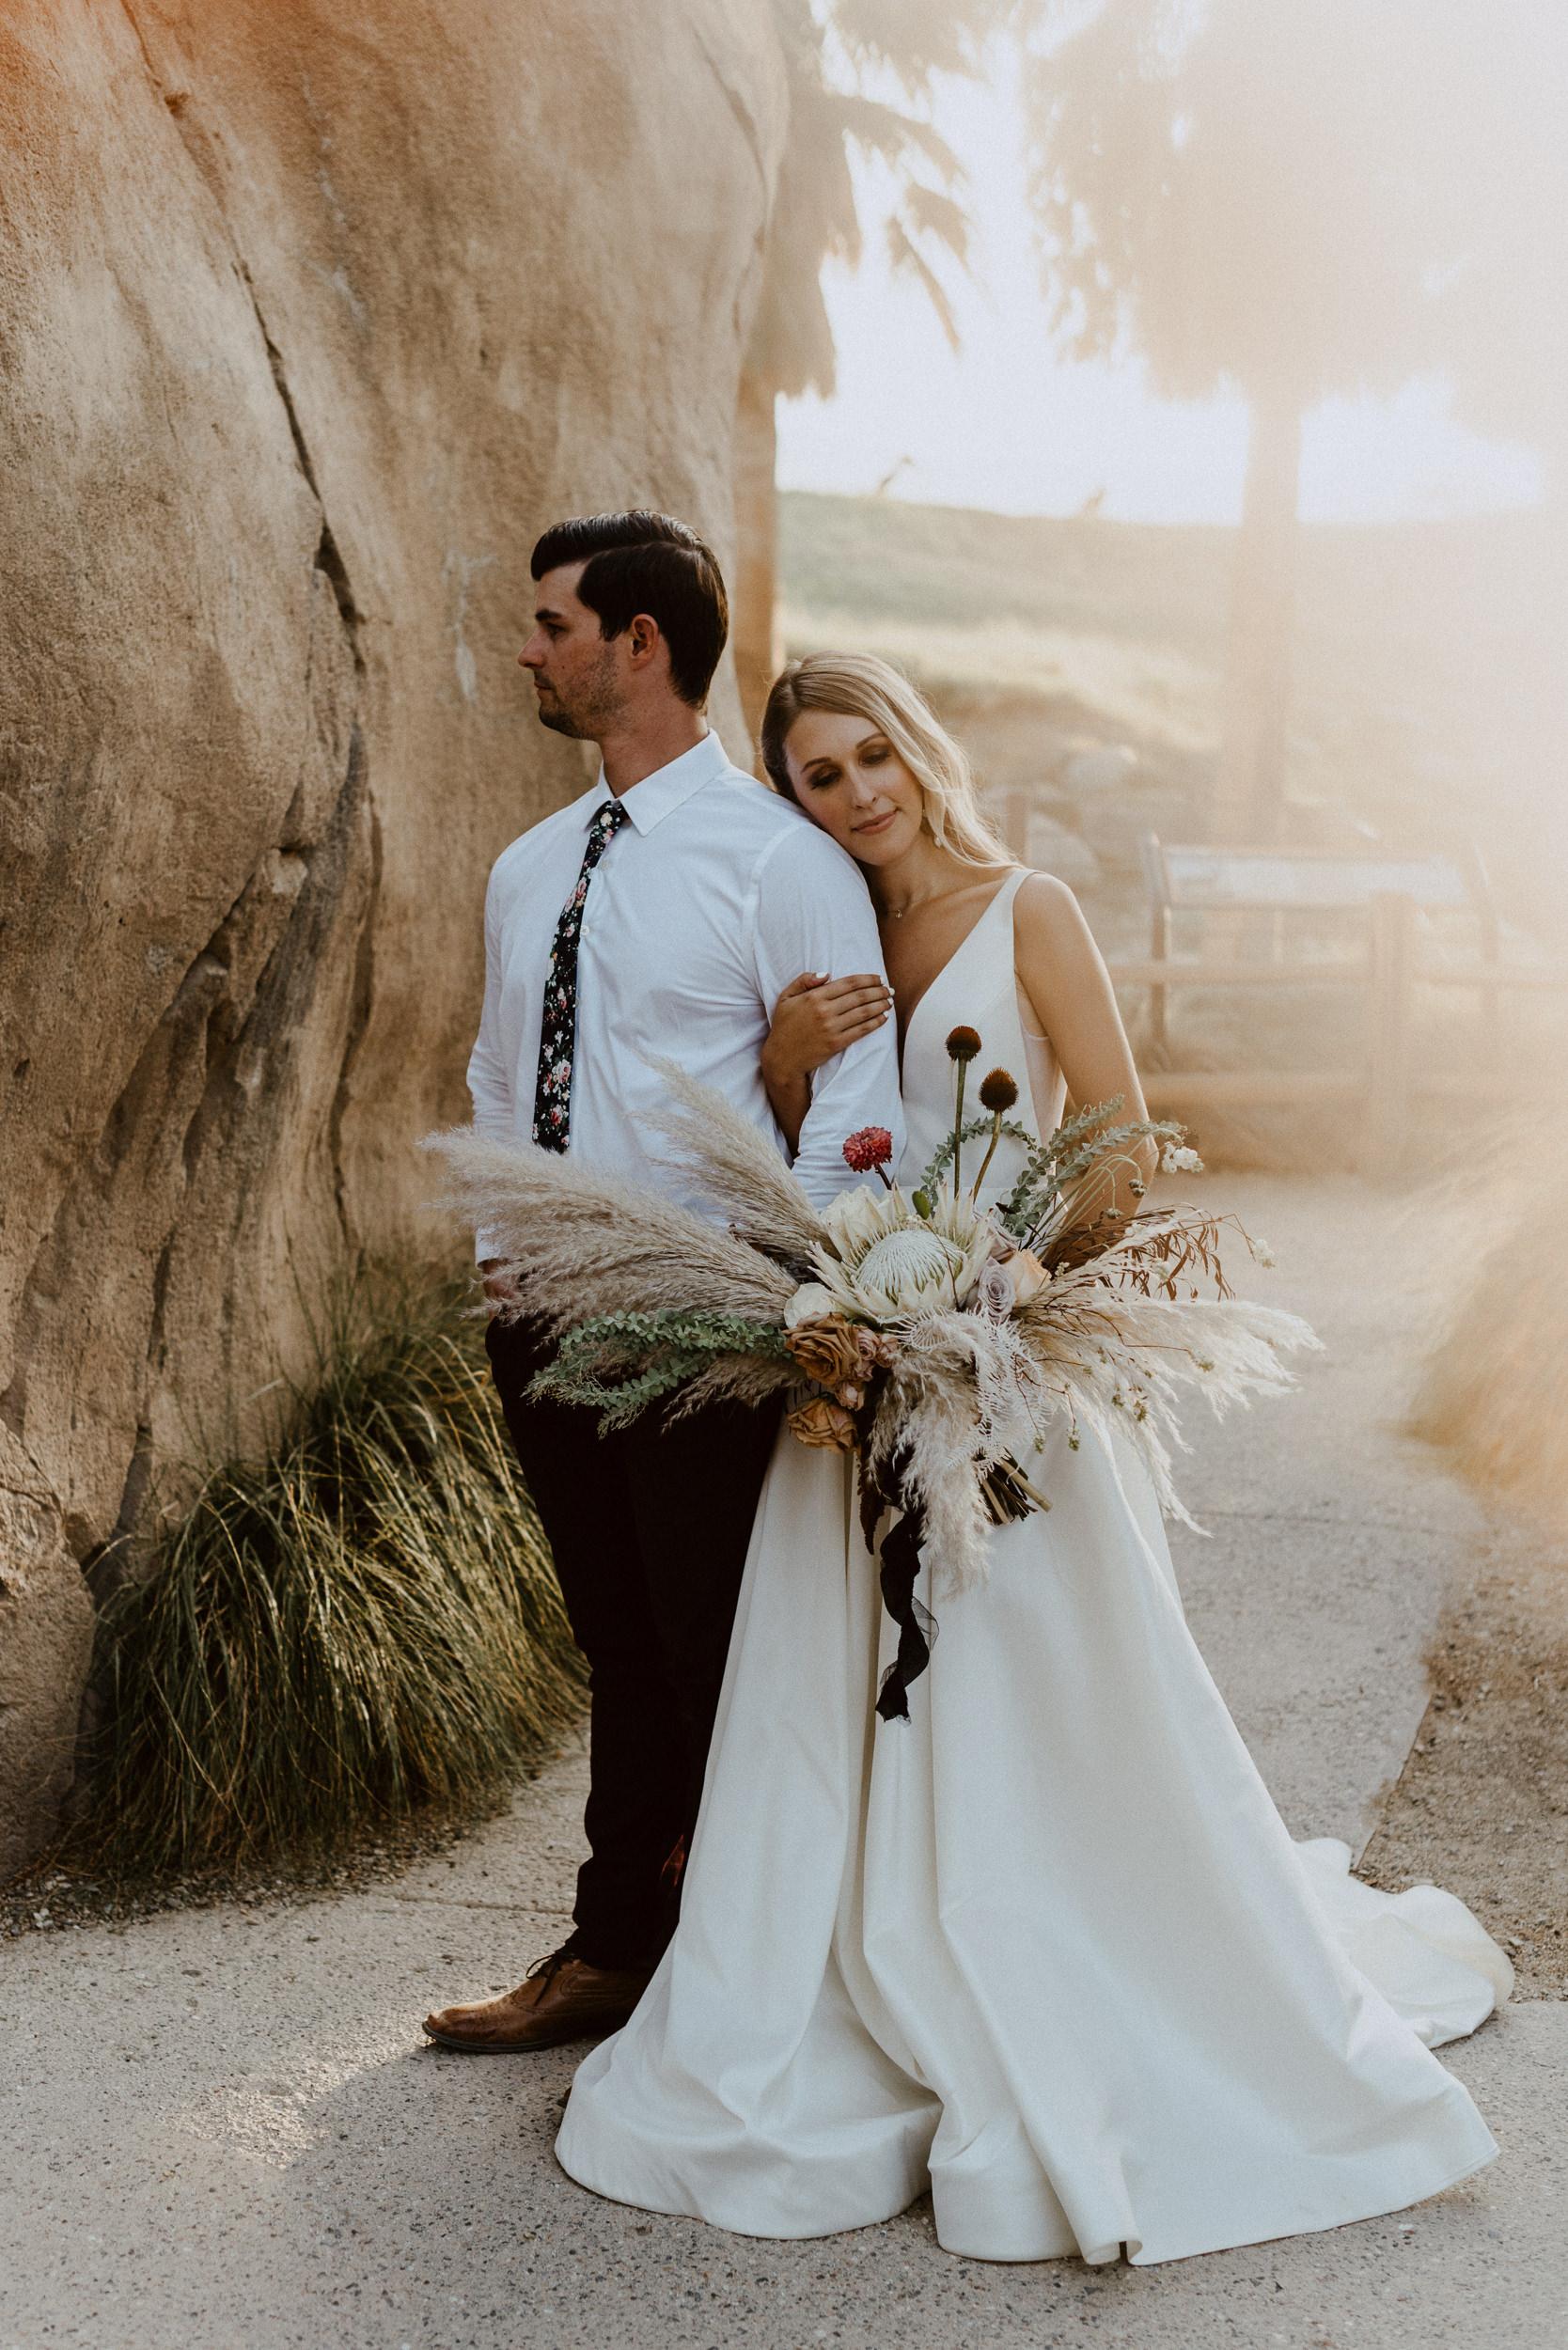 sChelsie + Chris - The Desert Shootout Wedding Romantics at The Living Desert-132.jpg